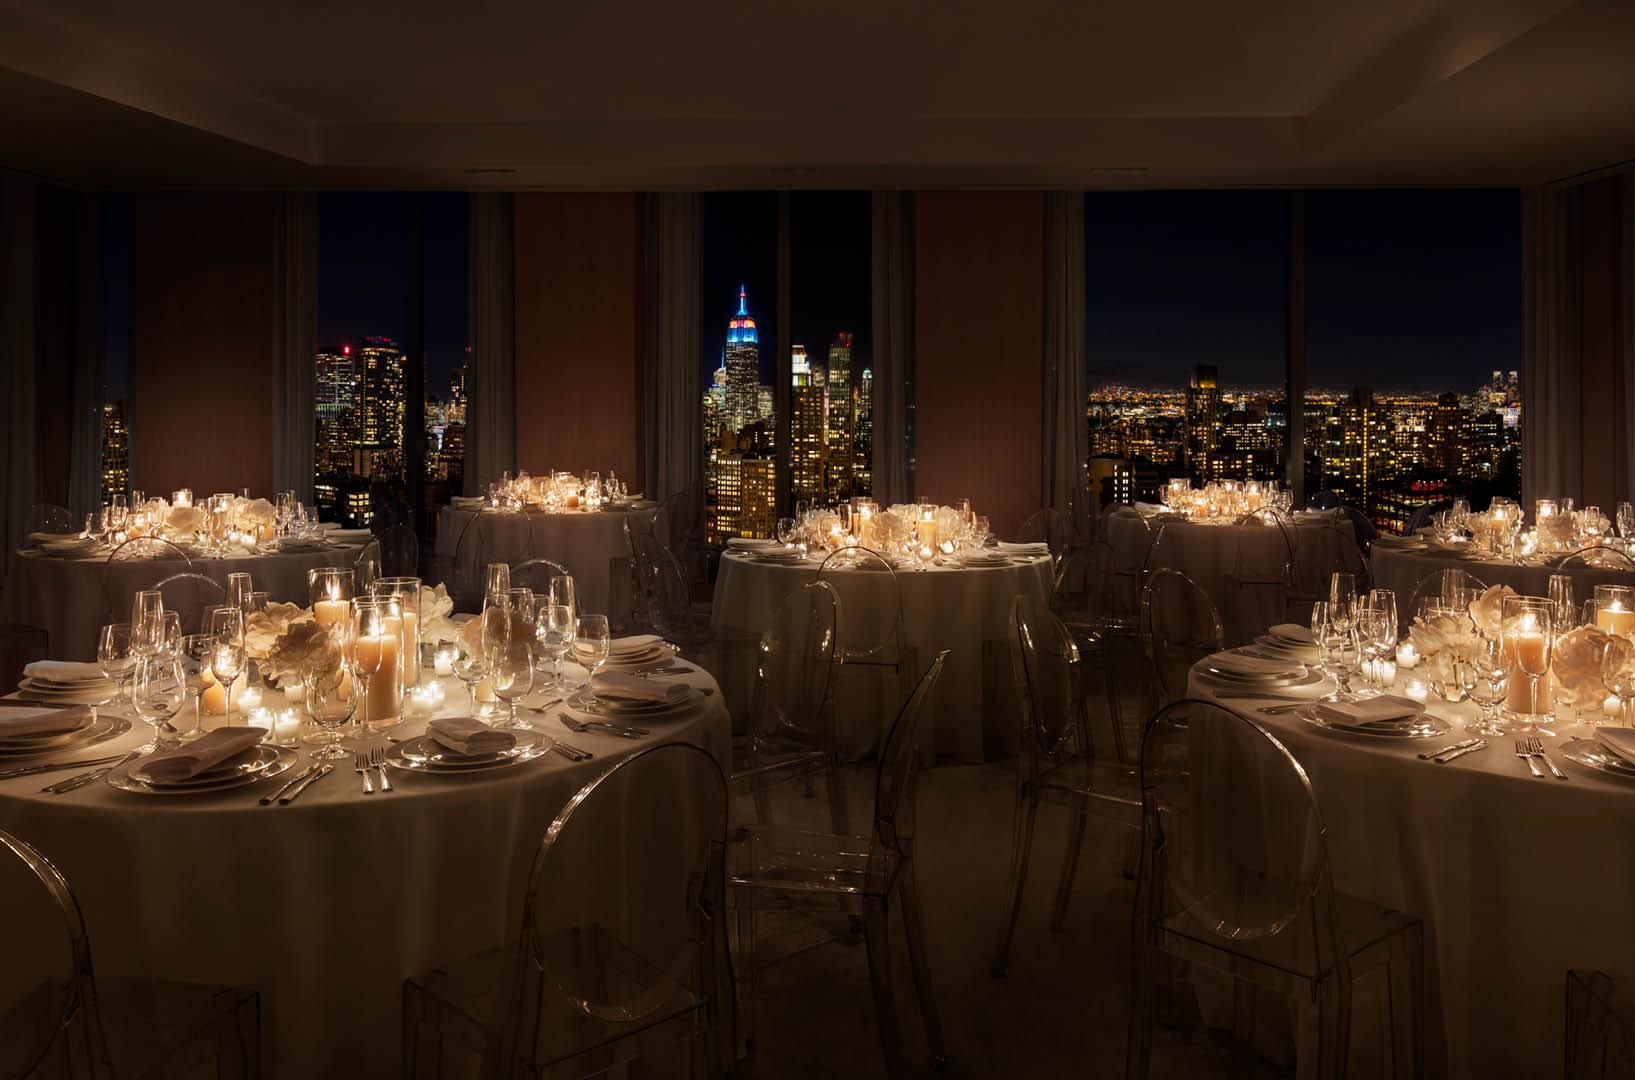 Public Hotel New York City An Ian Schrager Hotel Weddings